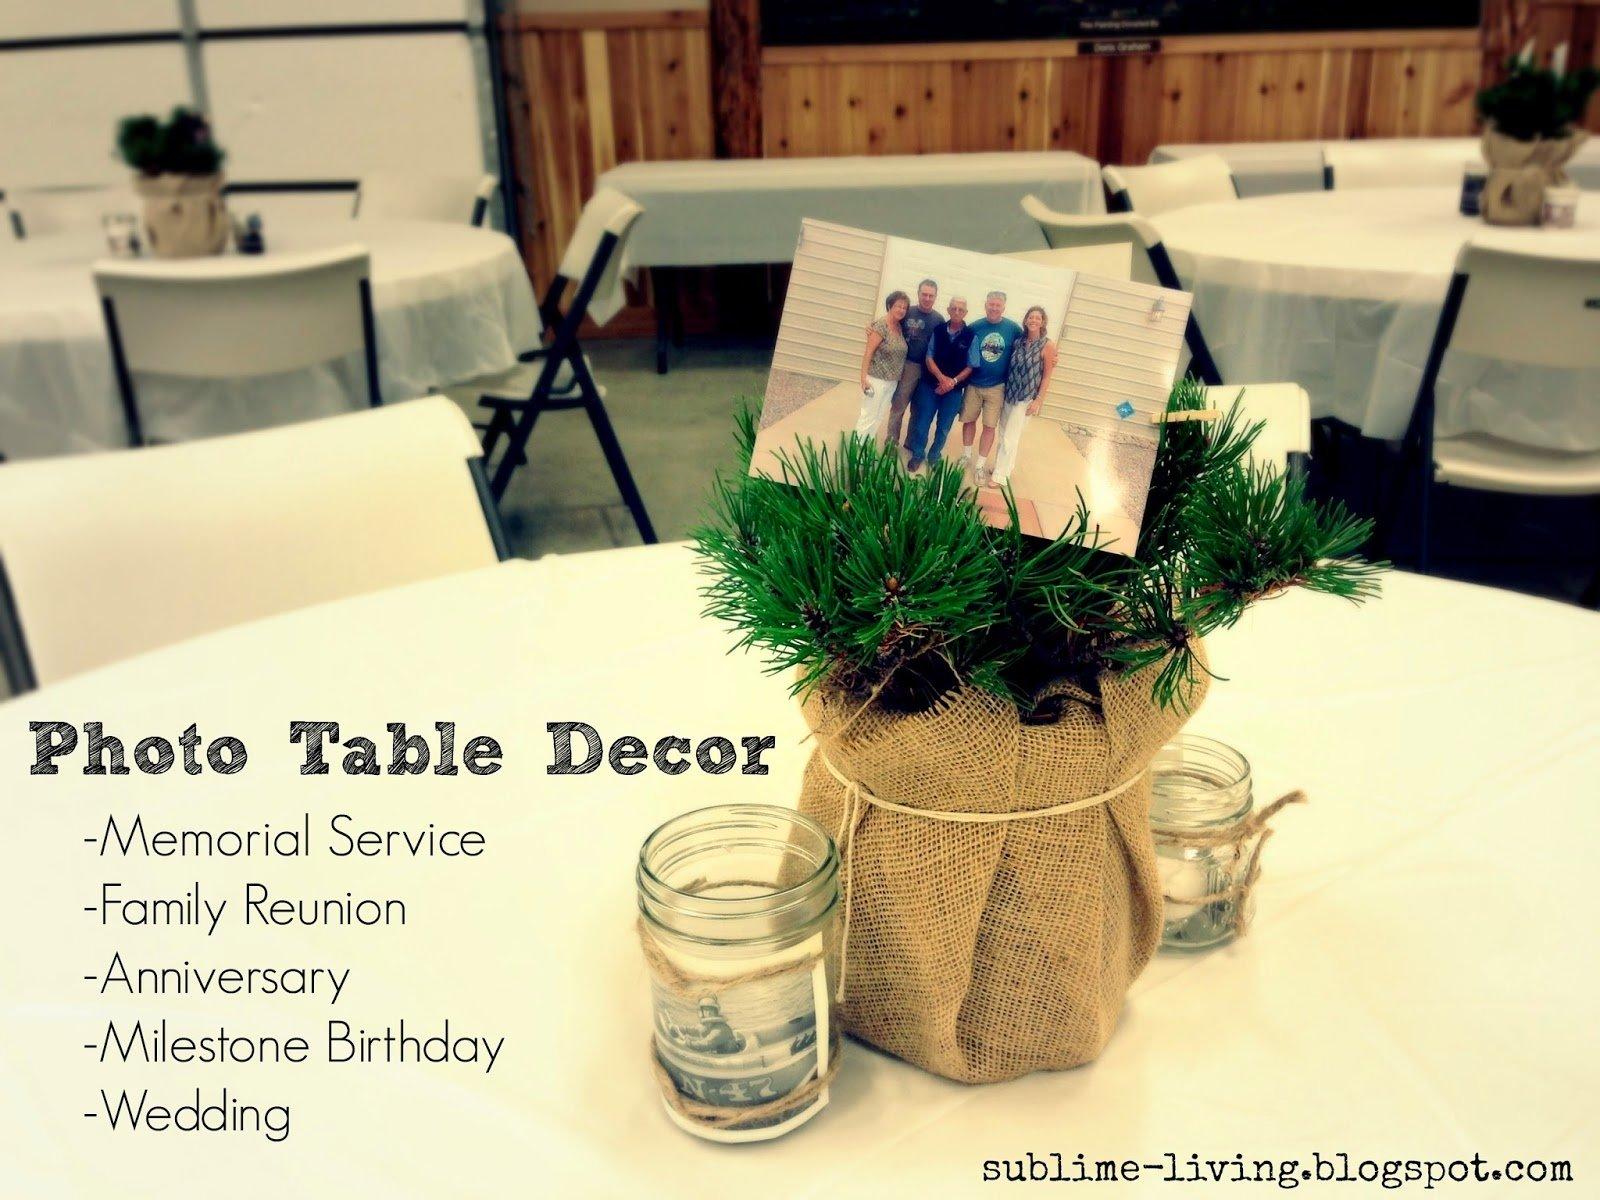 10 Most Popular Ideas For A Memorial Service rustic burlap mason jar photo table decor centerpieces candles 2021